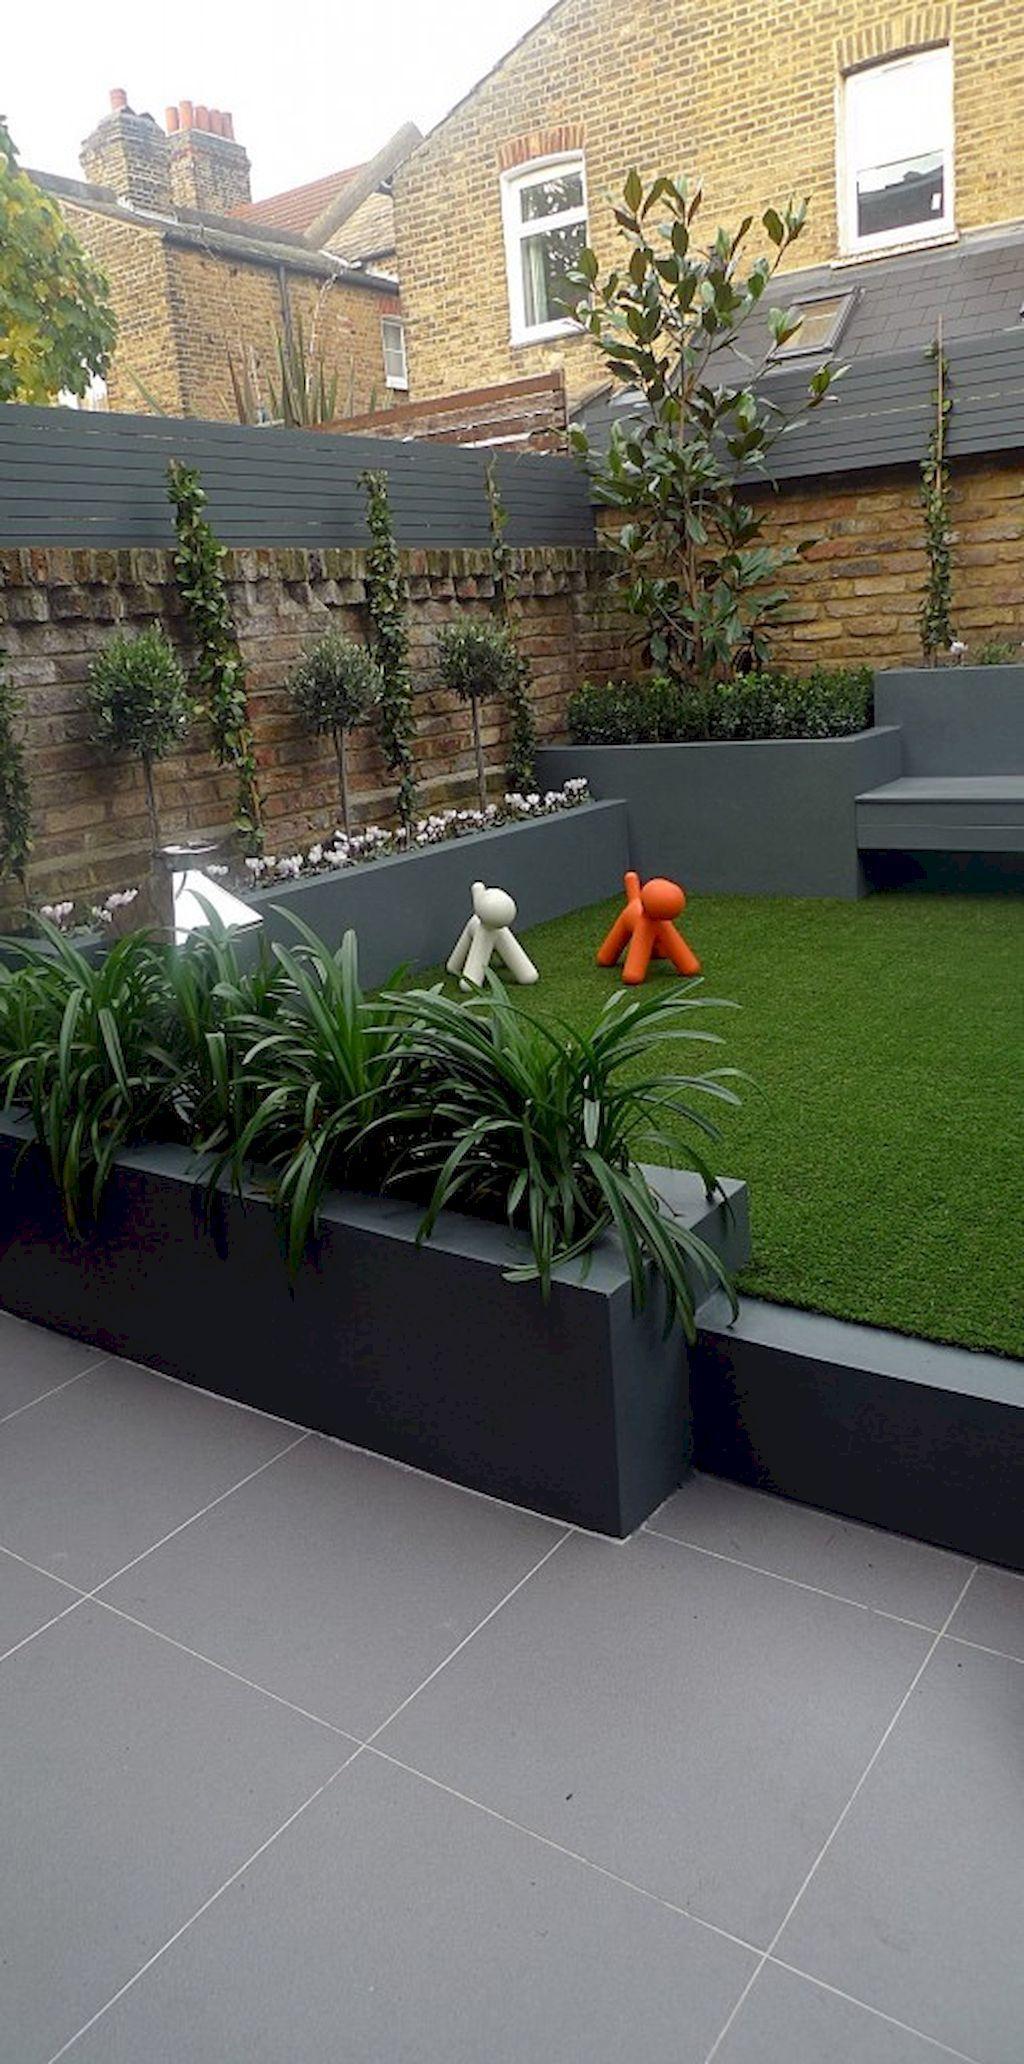 Awesome 60 Low Maintenance Small Backyard Garden Ideas Https Homeastern Com 2017 06 21 60 Low Maintenance Small Backyard Gard Tuin Tuin Ideeen Tuin En Terras